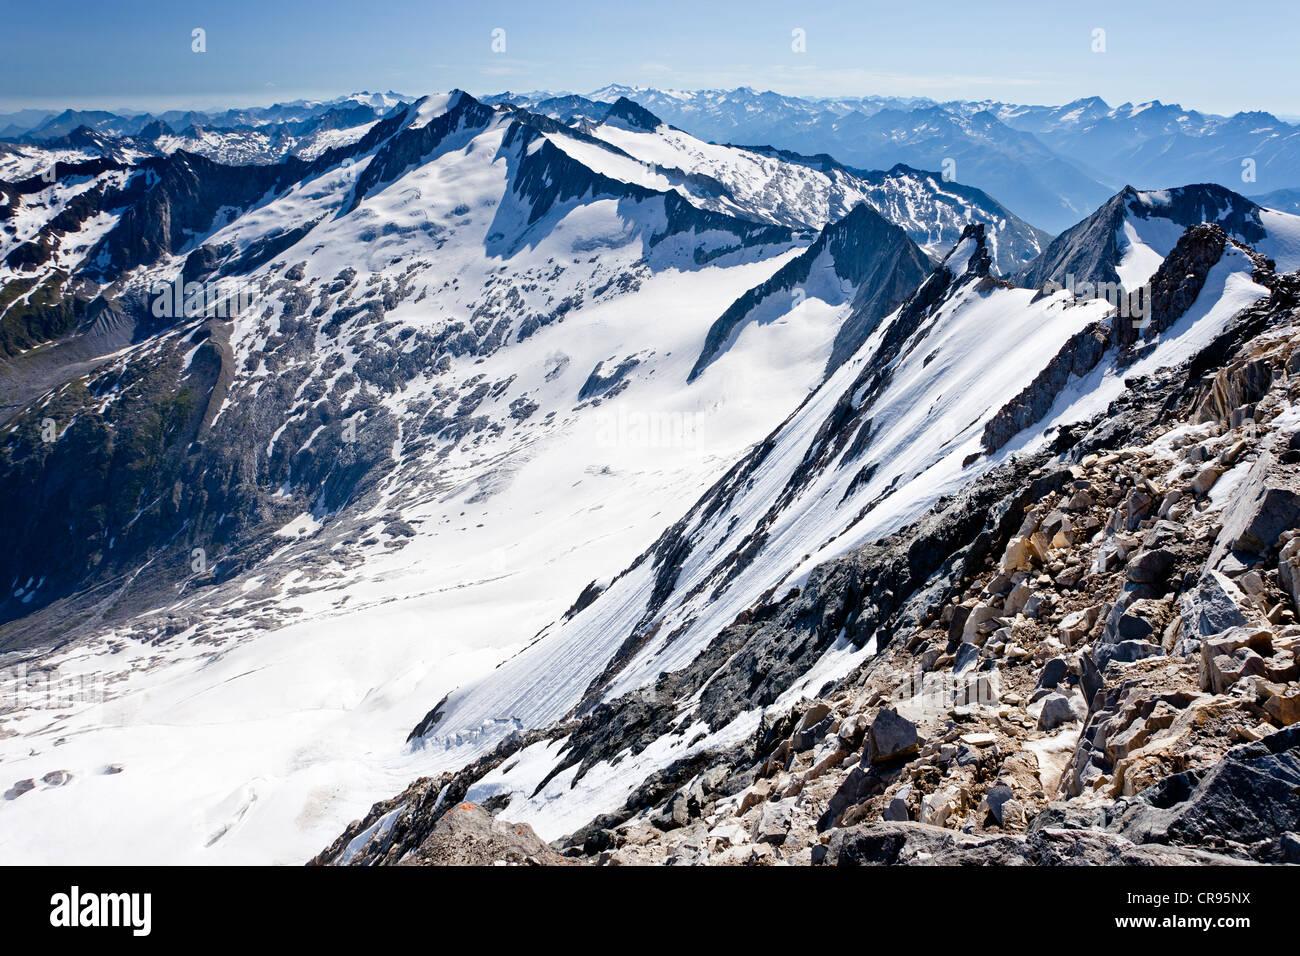 North face of Mt Hochfeiler, Pfitschertal valley, South Tyrol, Italy, Europe Stock Photo